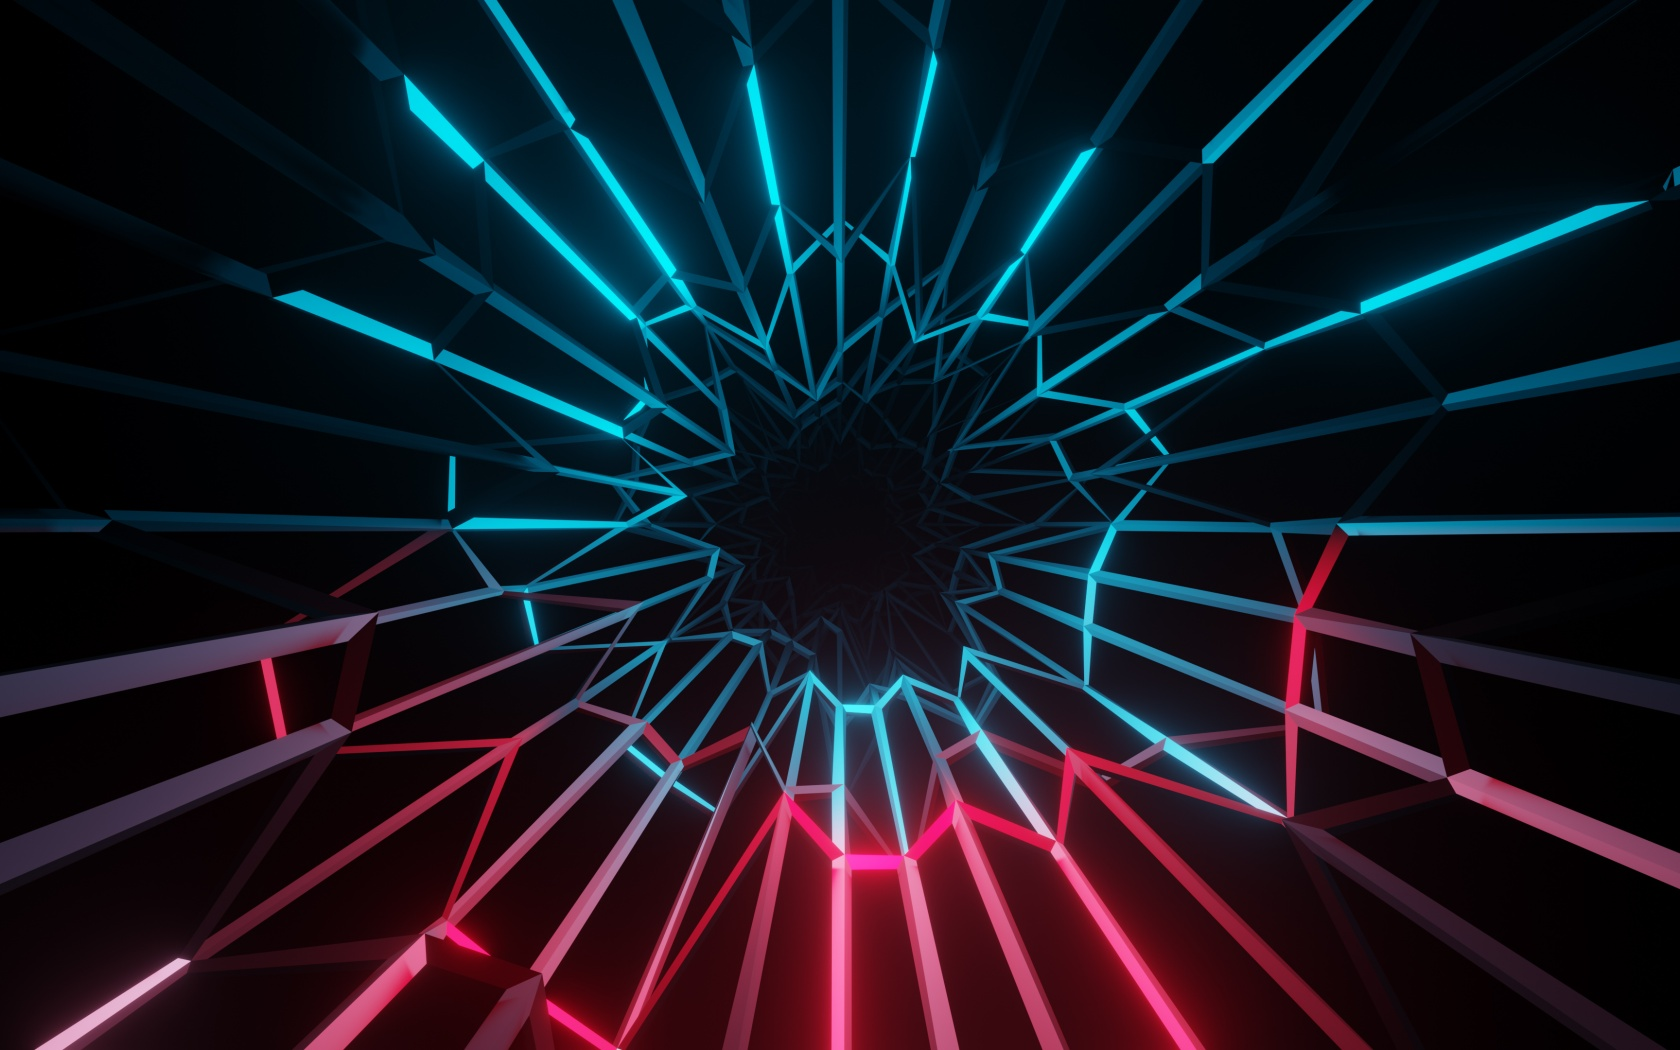 Electric Wallpaper 4K Neon Colorful Dark background